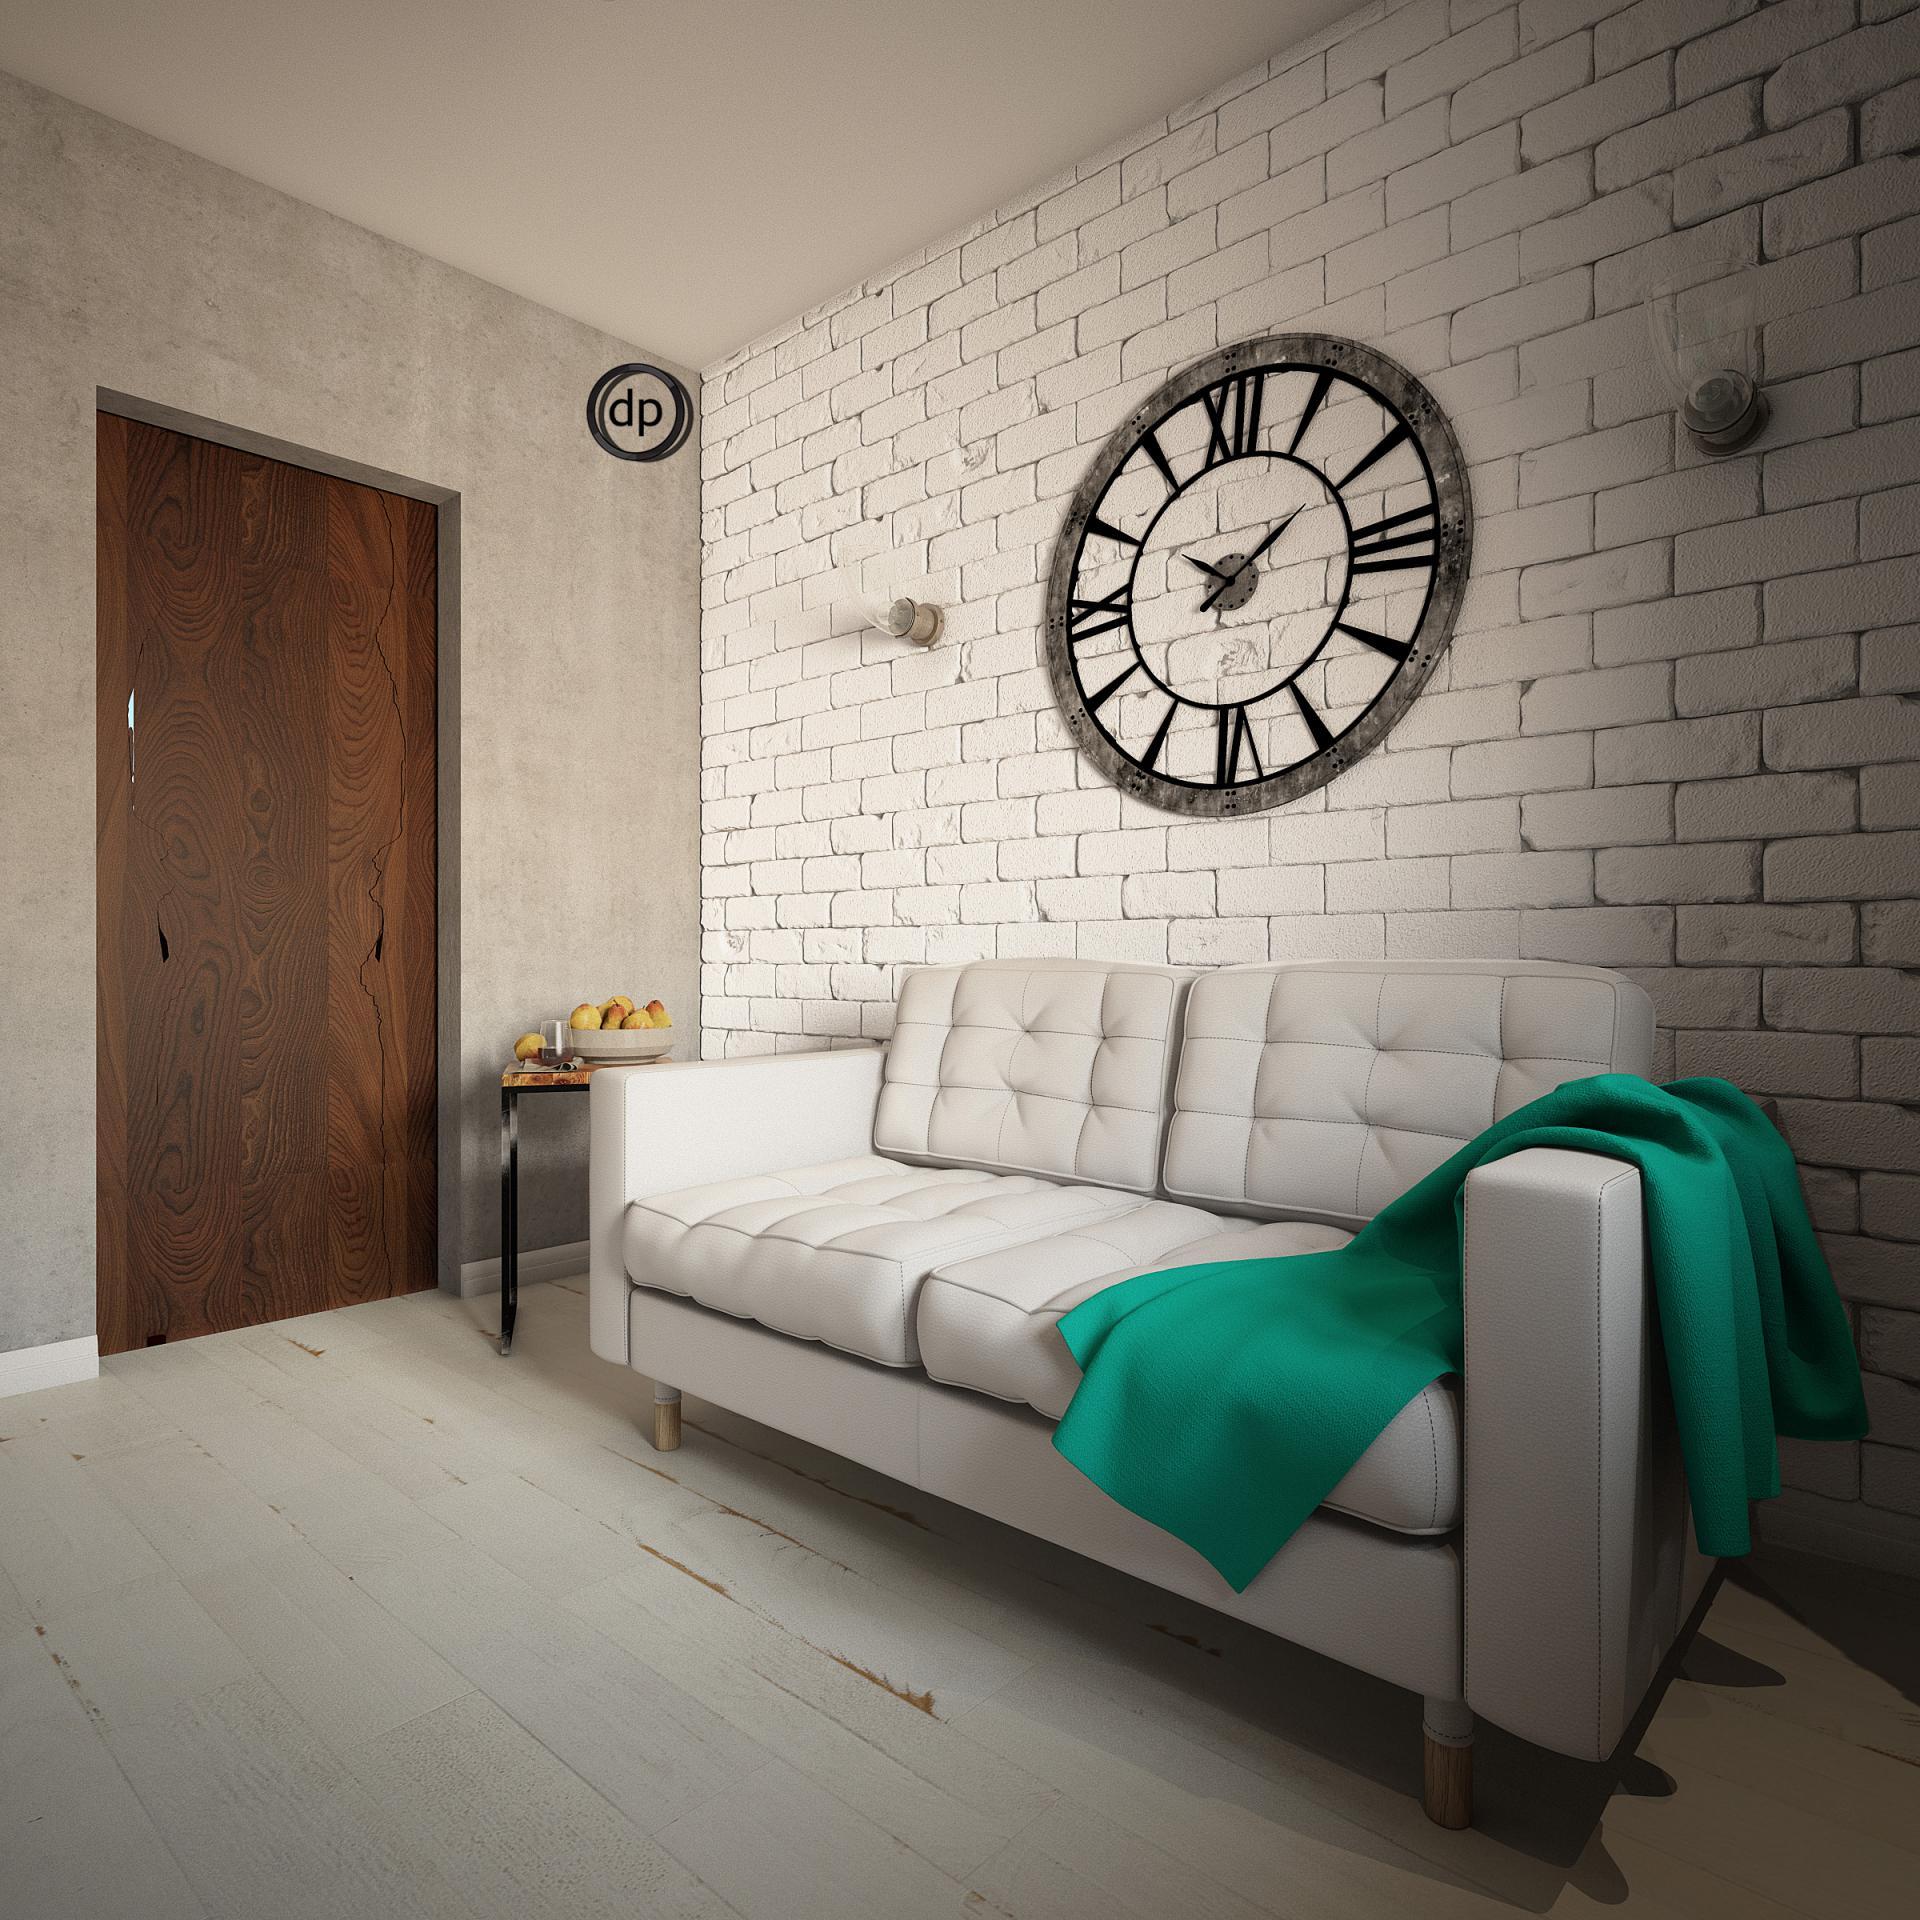 Лофт в малогабаритной квартире